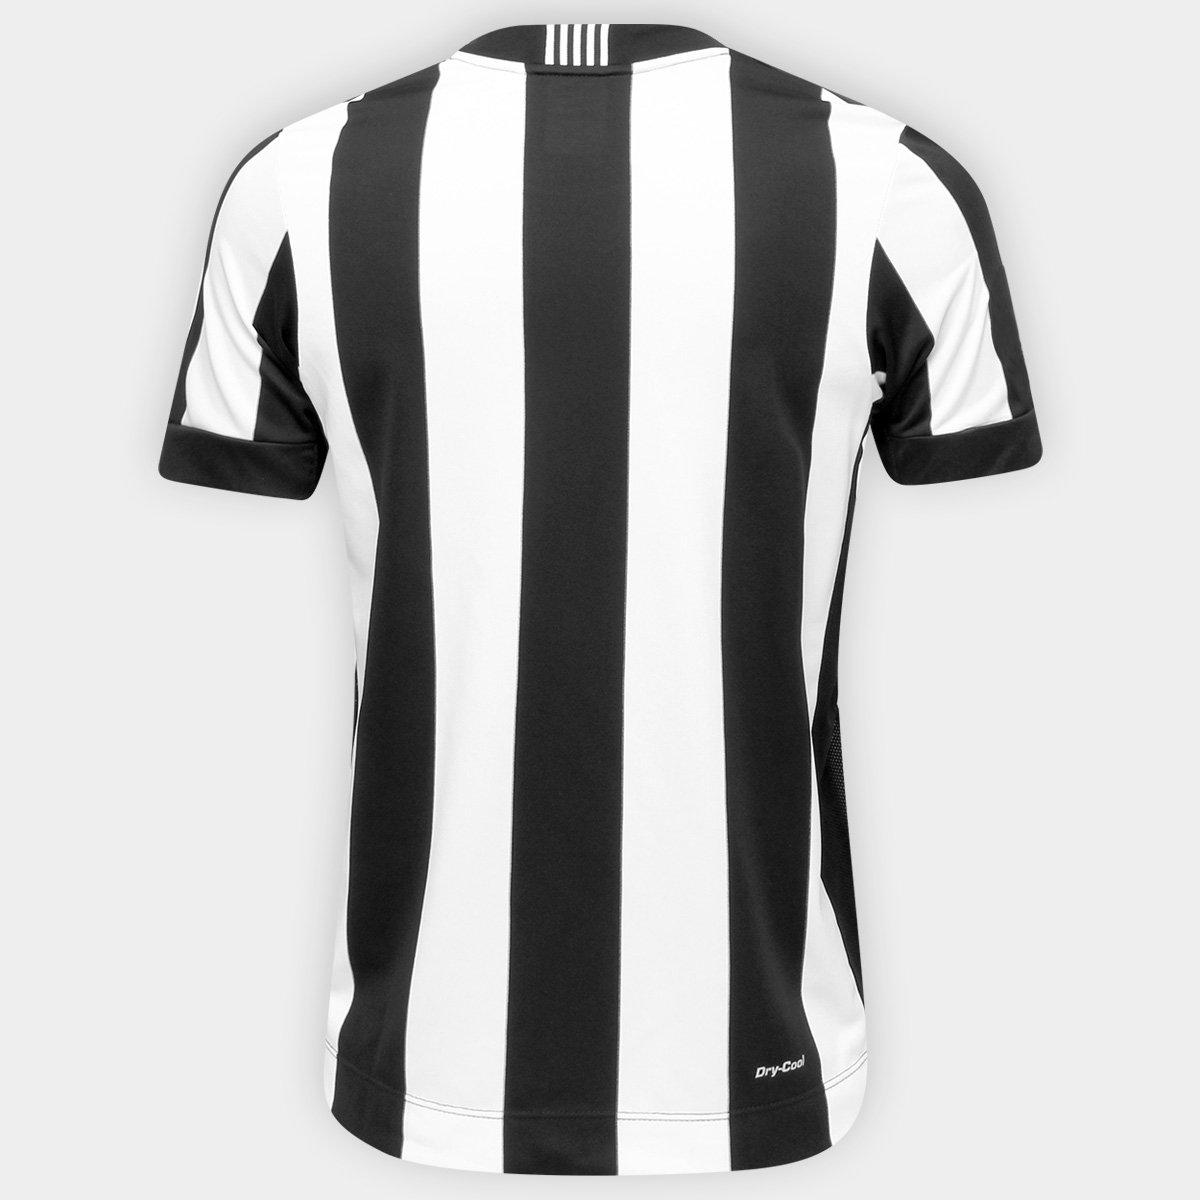 095afdf87f Camisa Botafogo I 2016 s nº Torcedor Topper Masculina - Preto e ...